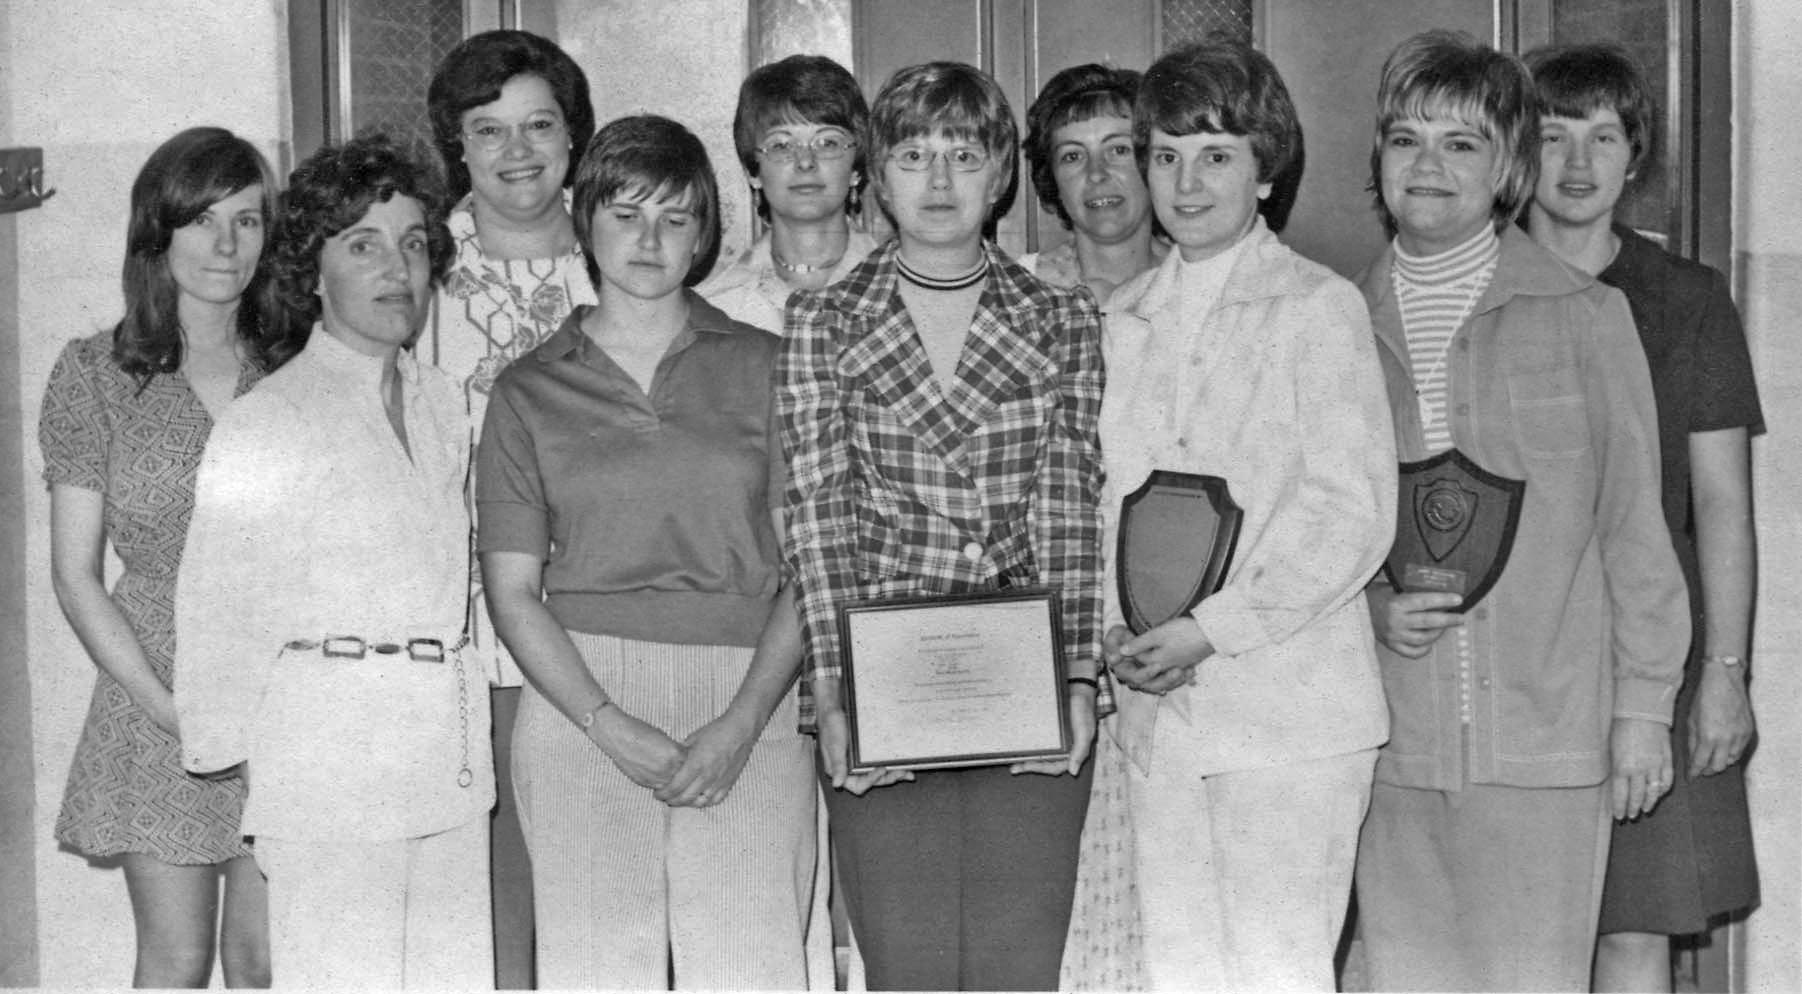 front row: Carol Funk, Cheryl Larson, Pat Merriman, Cathy Hegg and Judy Brisbine; back row: Marla Schlepp, Beatrice Vetter, Mrs. Doug (Sally) Raddershadt, Mary Ann Hopper and Pat Larson-Carsrud.